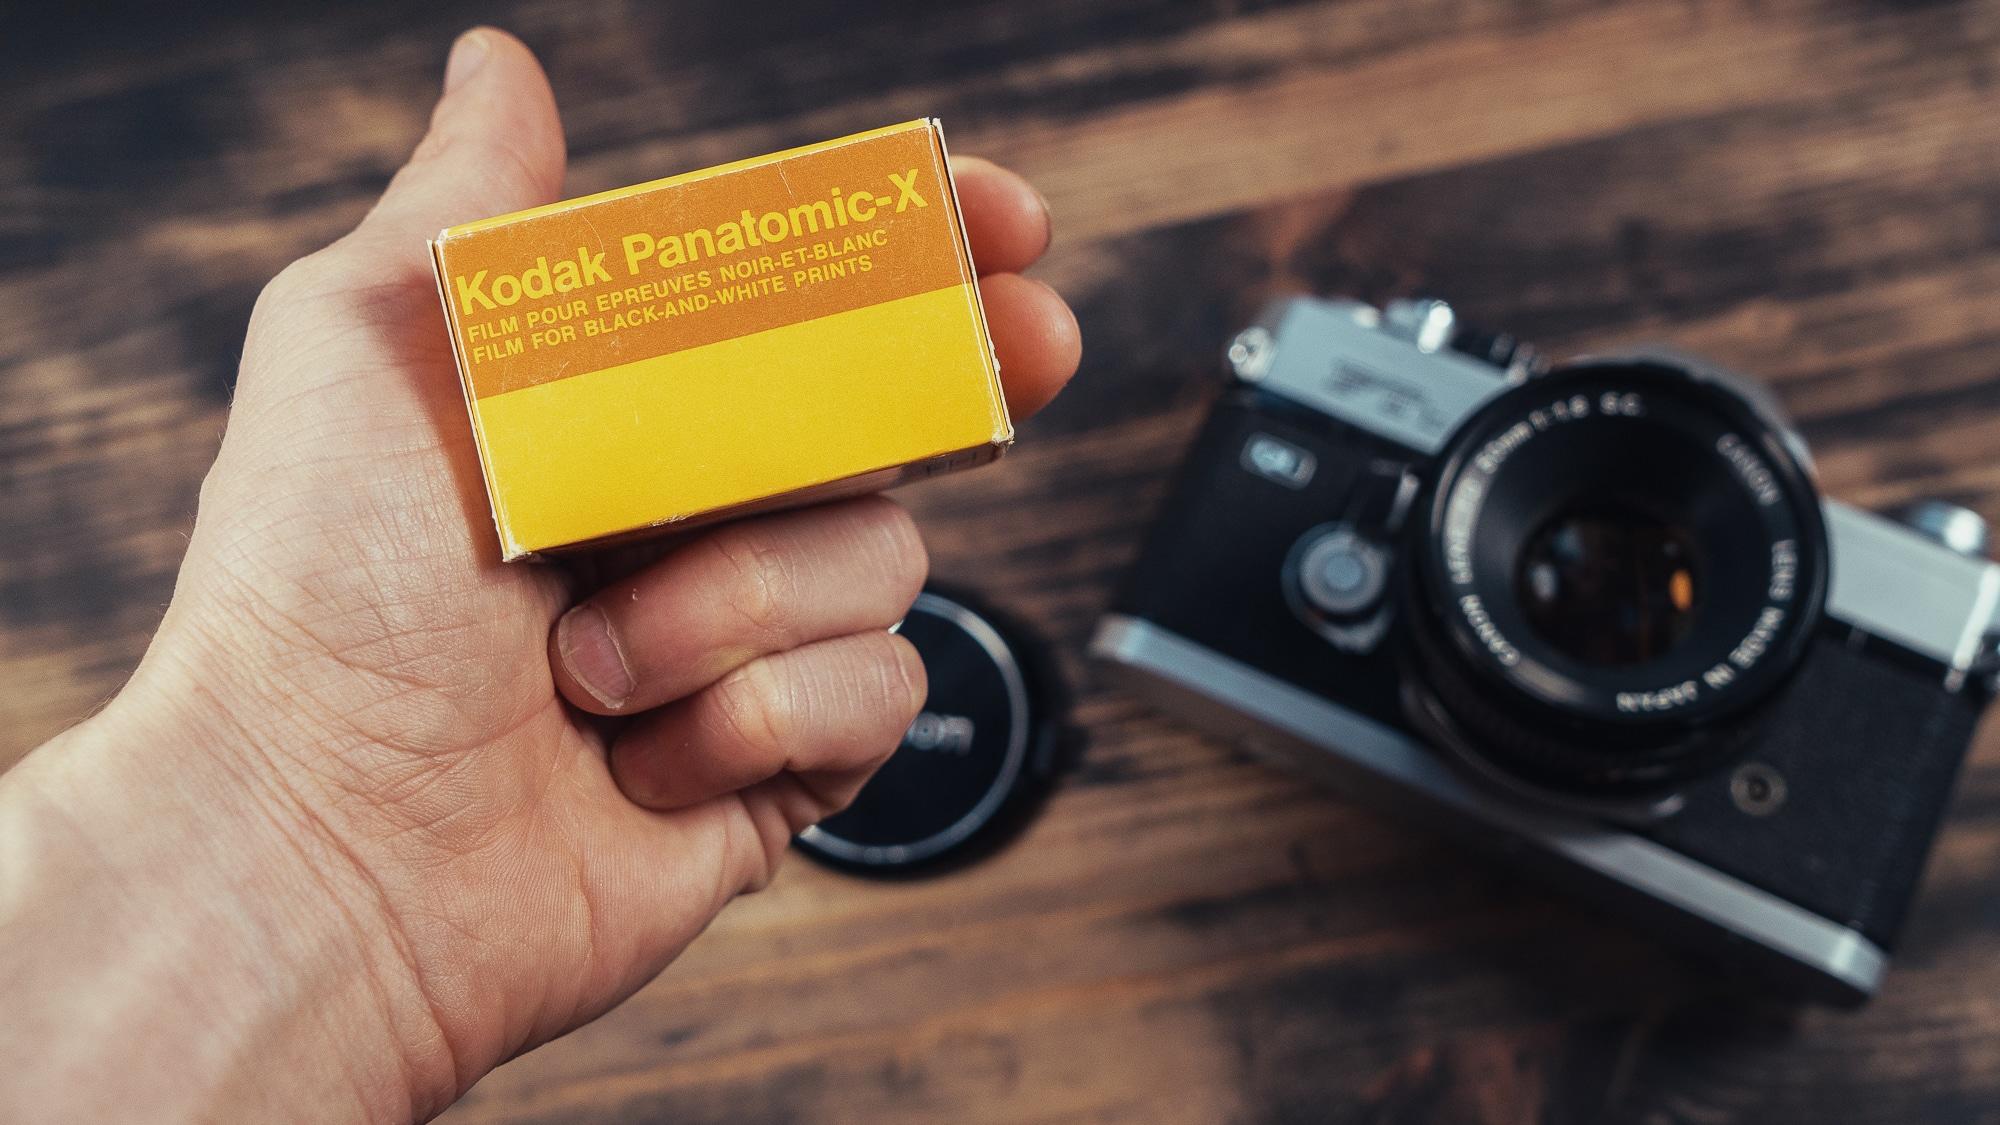 Kodak Panatomic-X : Un film de Légende !